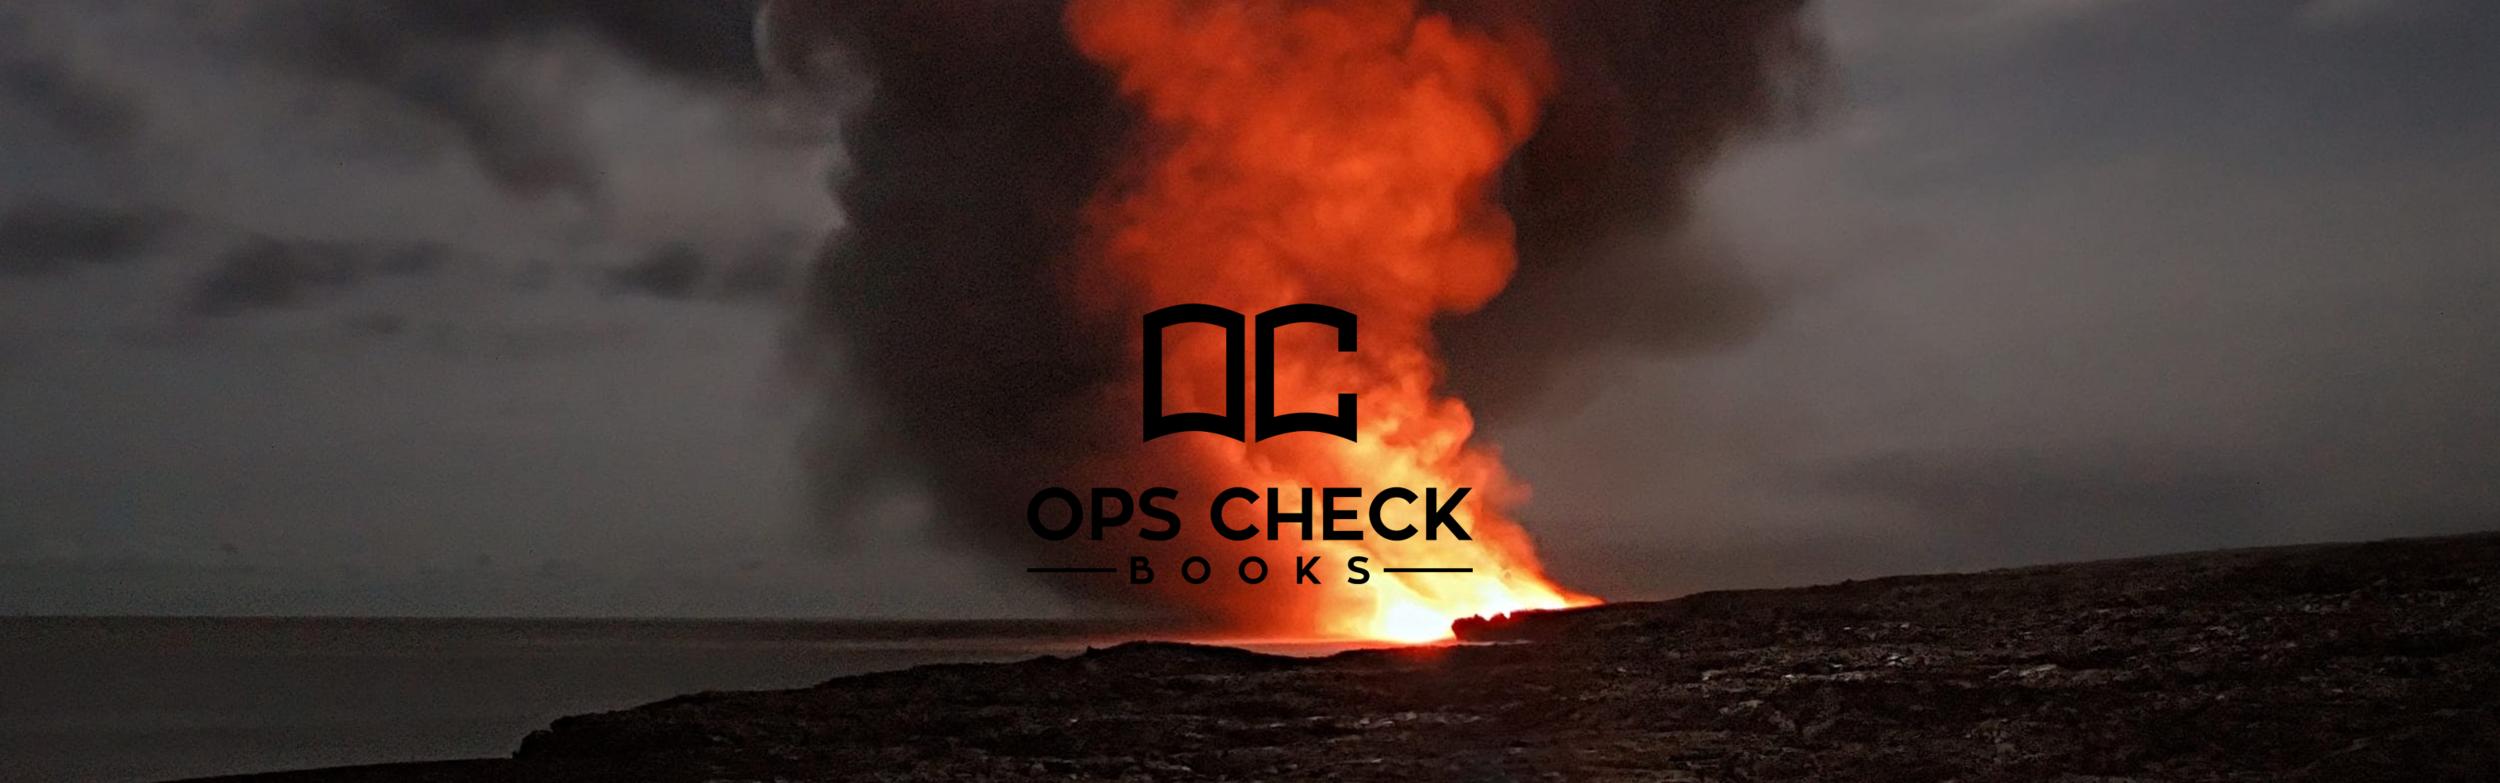 Ops Check small logo volcano.png